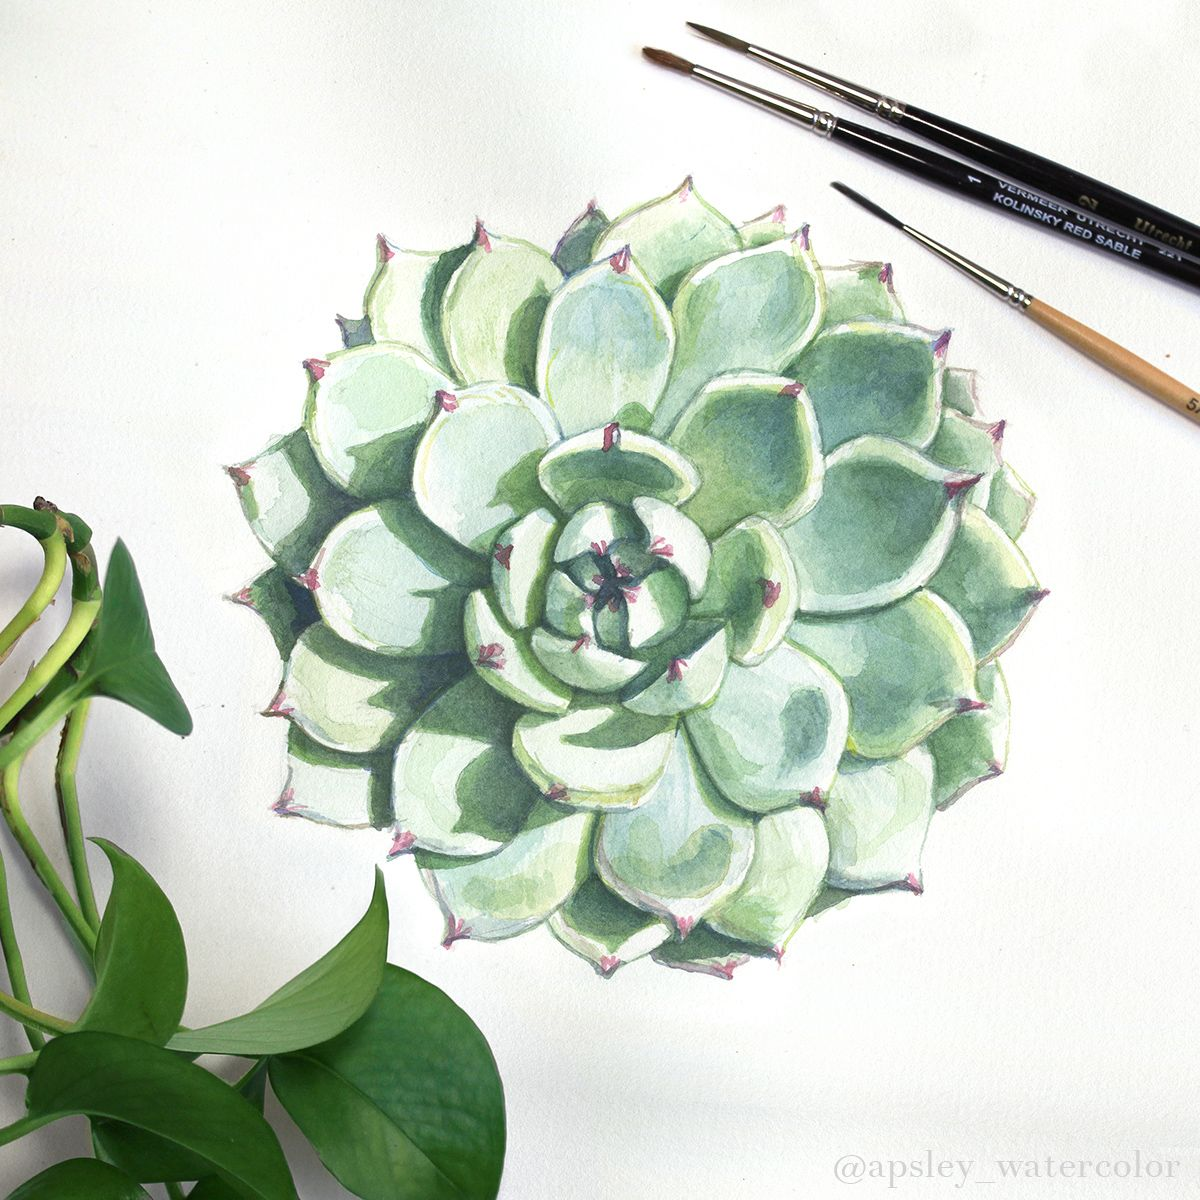 Aaronapsley Echeveria Colorata Watercolor Botanical